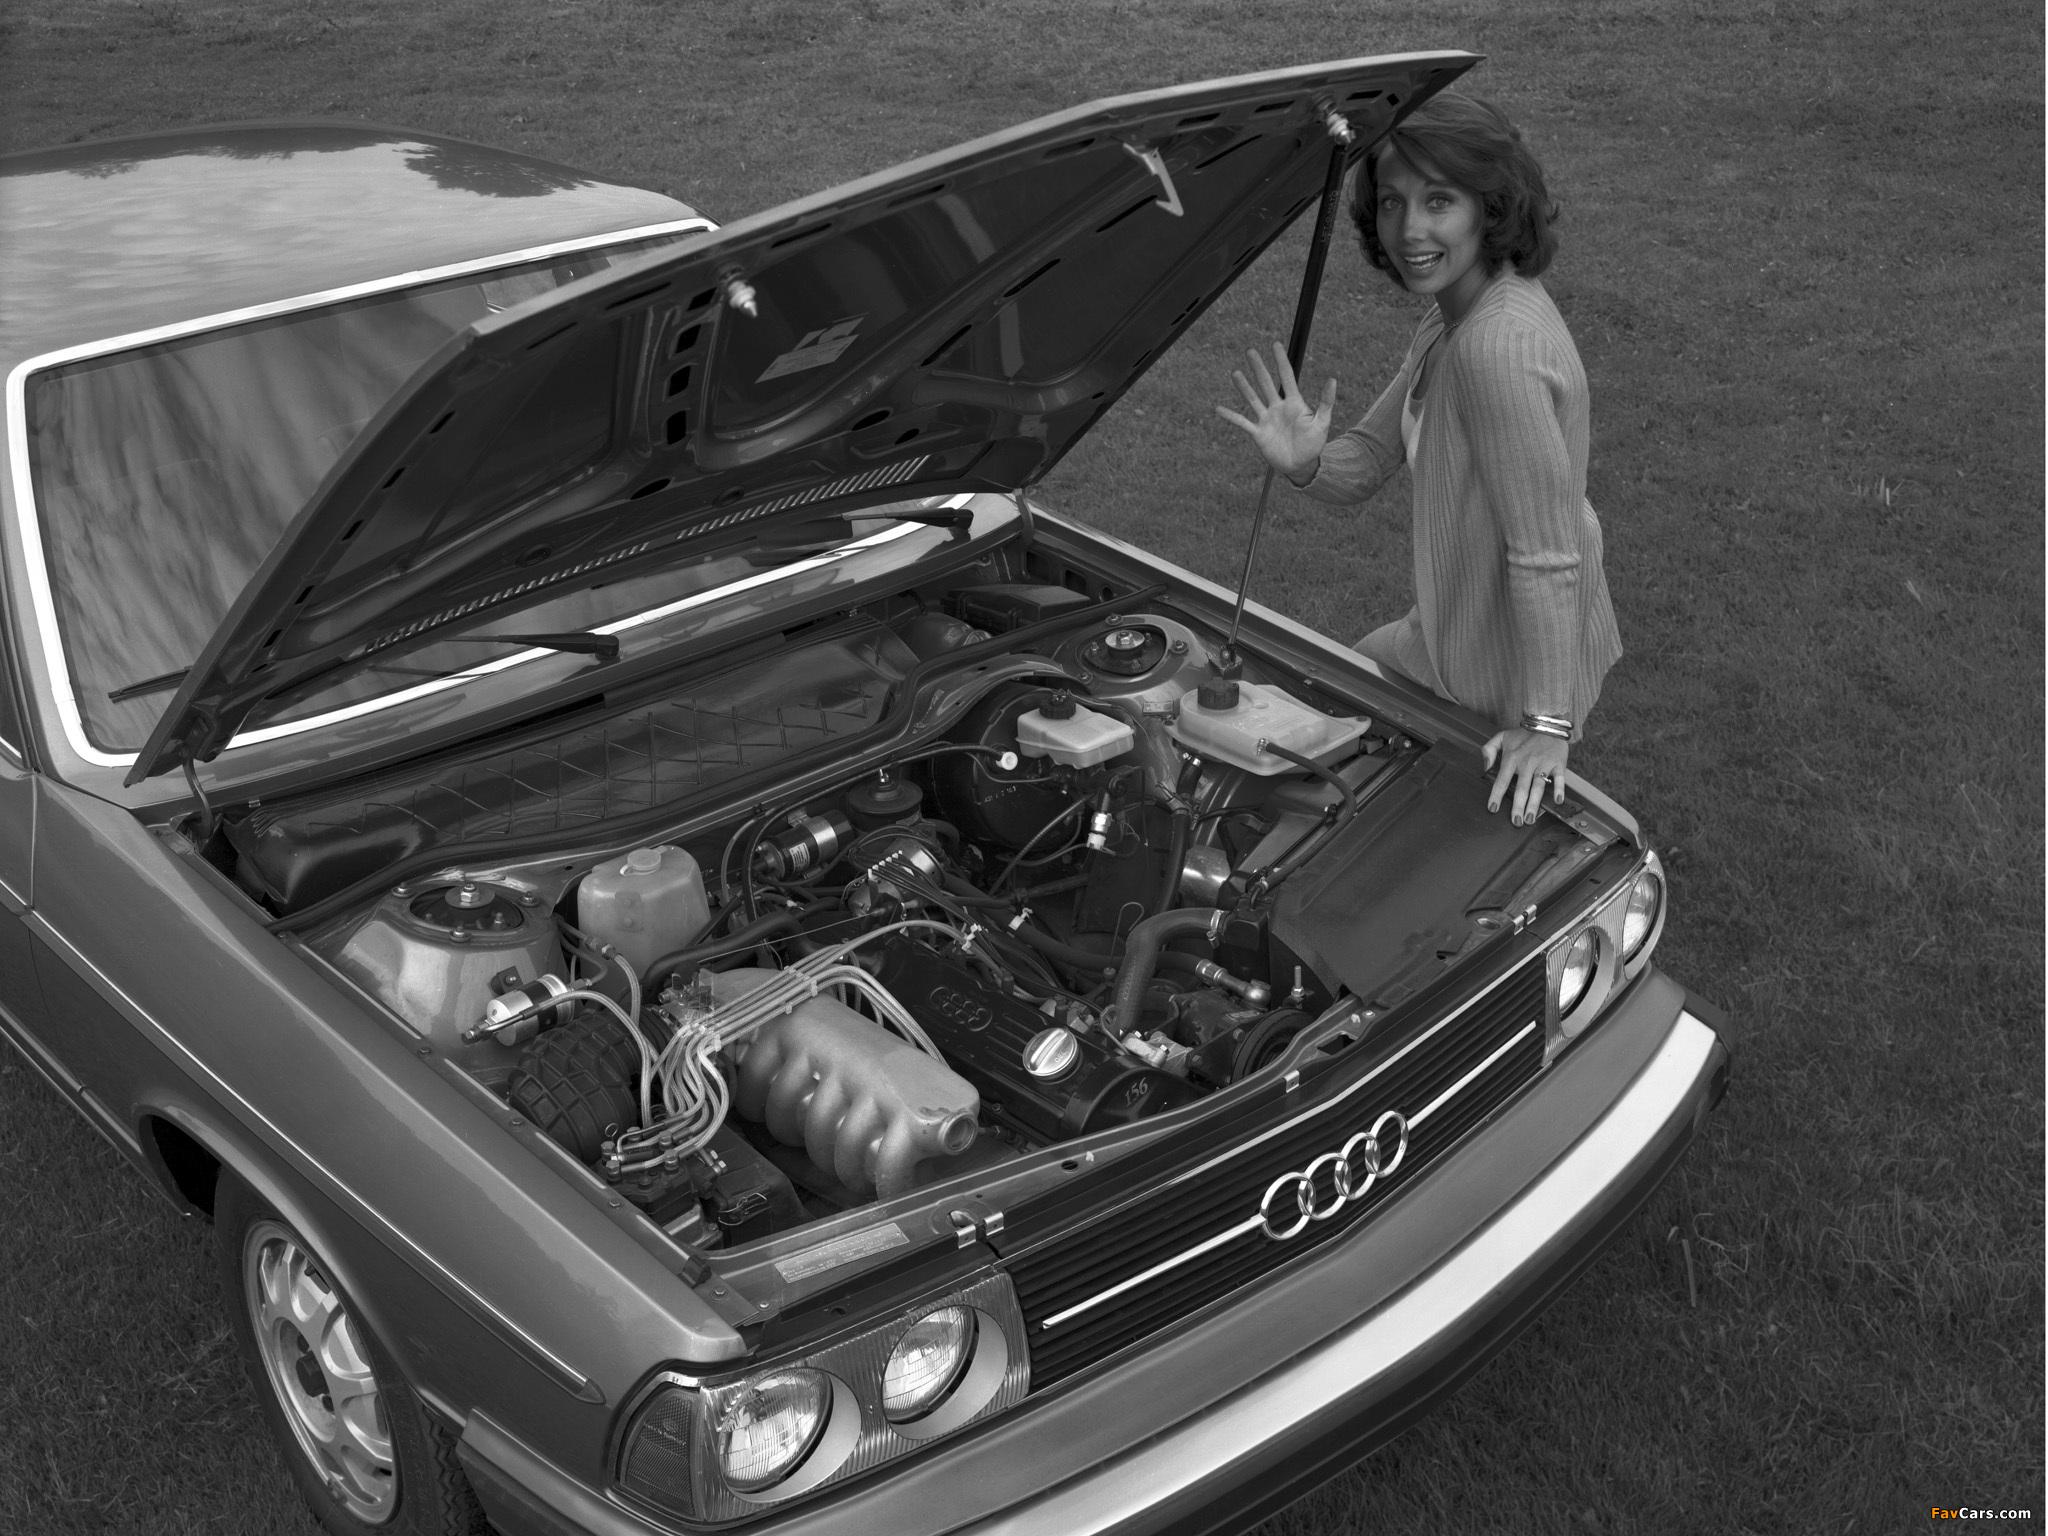 Audi 5000 43 1978 1980 Pictures 2048x1536